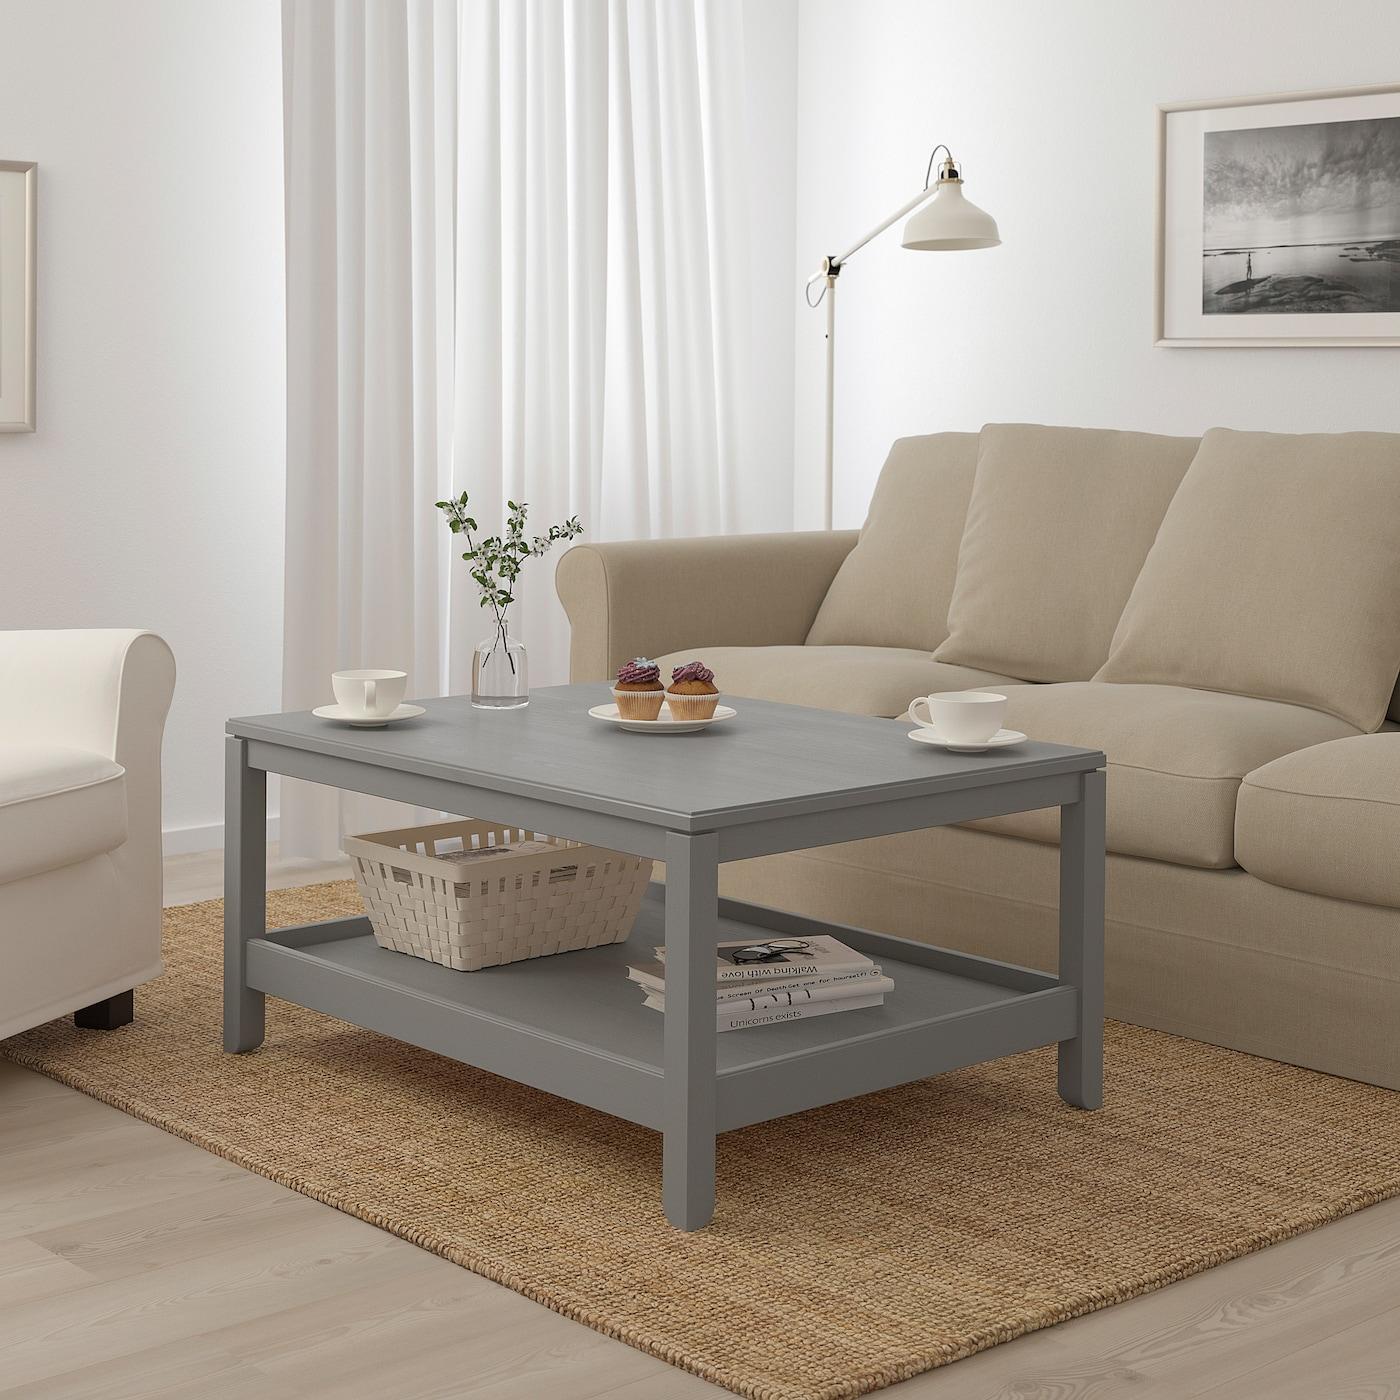 Havsta Coffee Table Gray 39 3 8x29 1 2 Ikea [ 1400 x 1400 Pixel ]